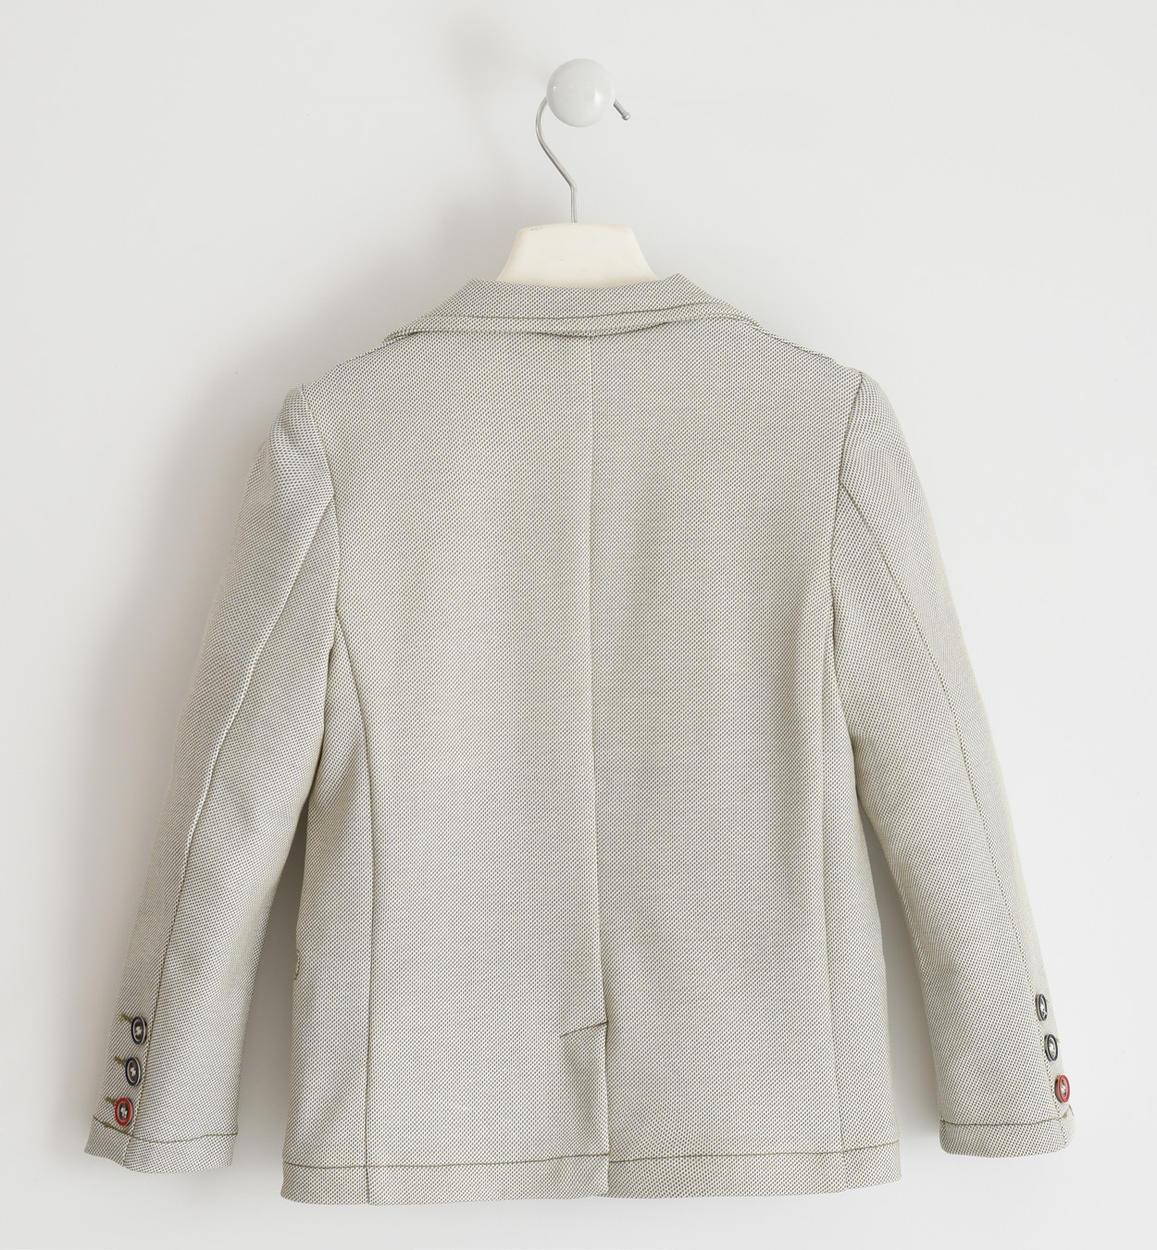 giacca in felpa micro pois per bambino d panna retro 02 2744j46200 6mc7 150x150